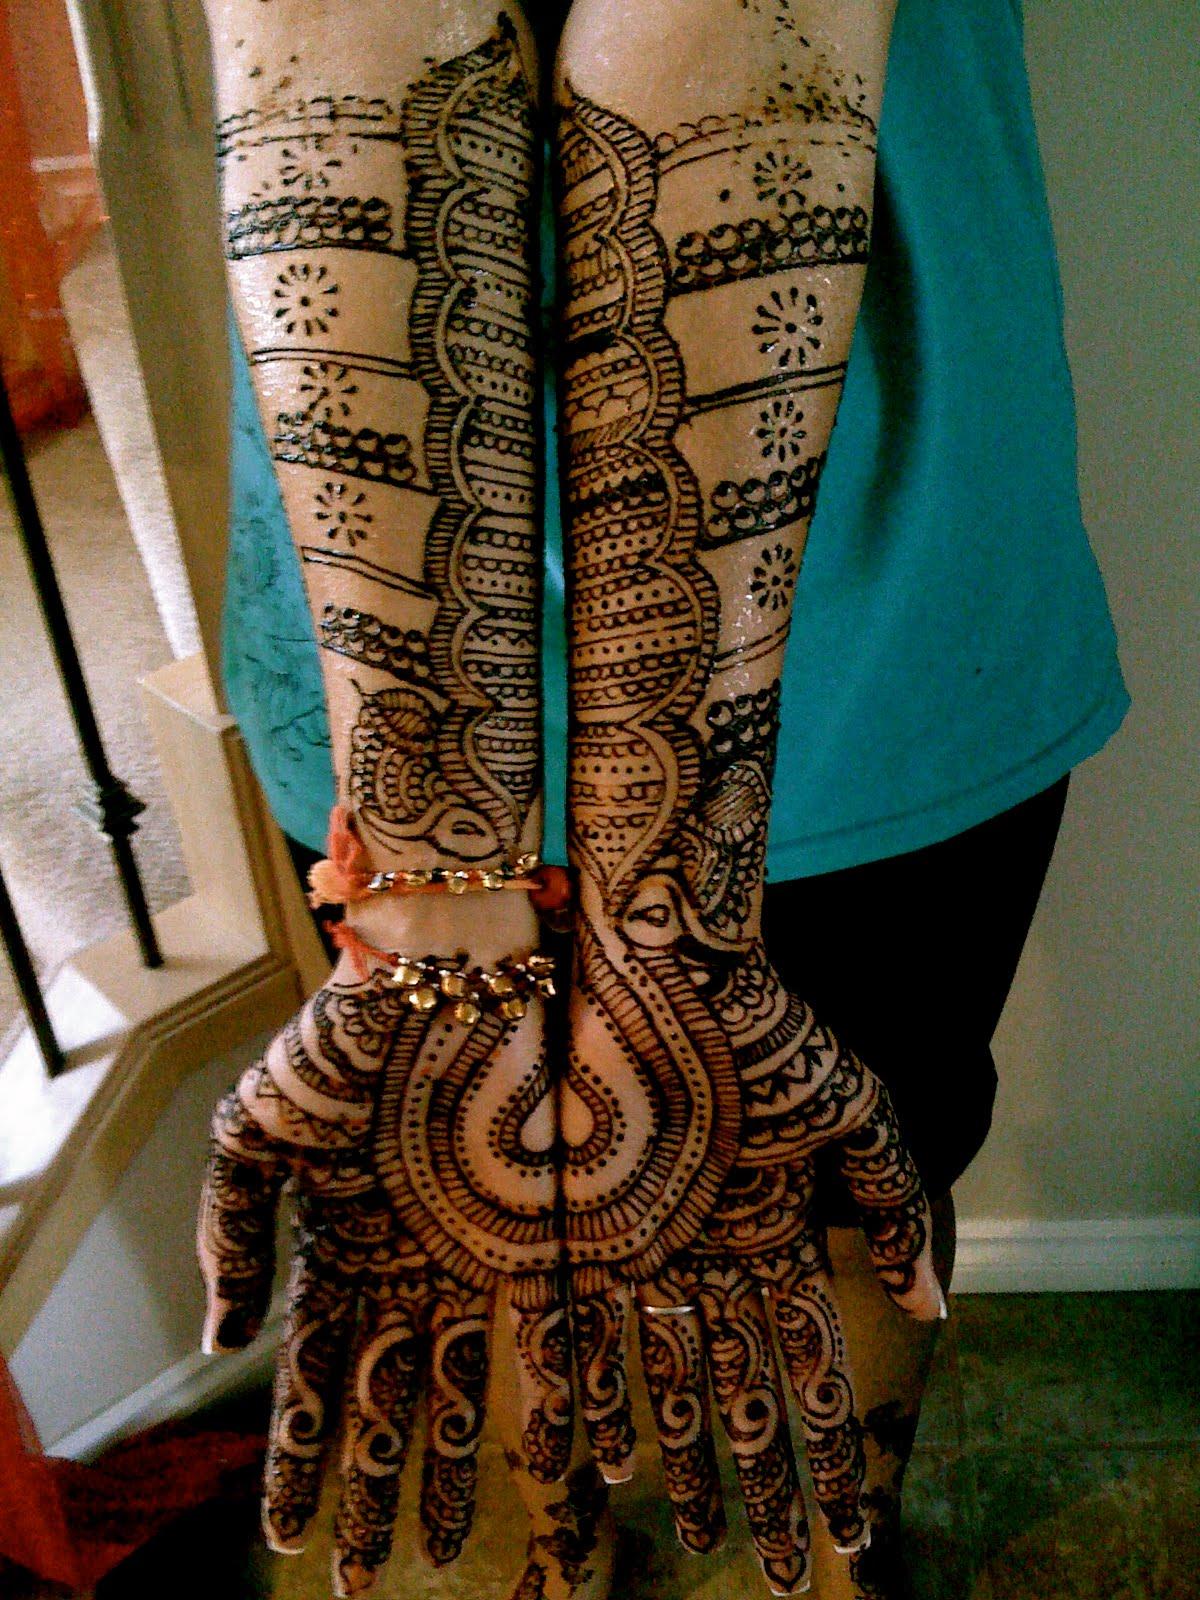 Tattoo wedding rings wedding plan ideas